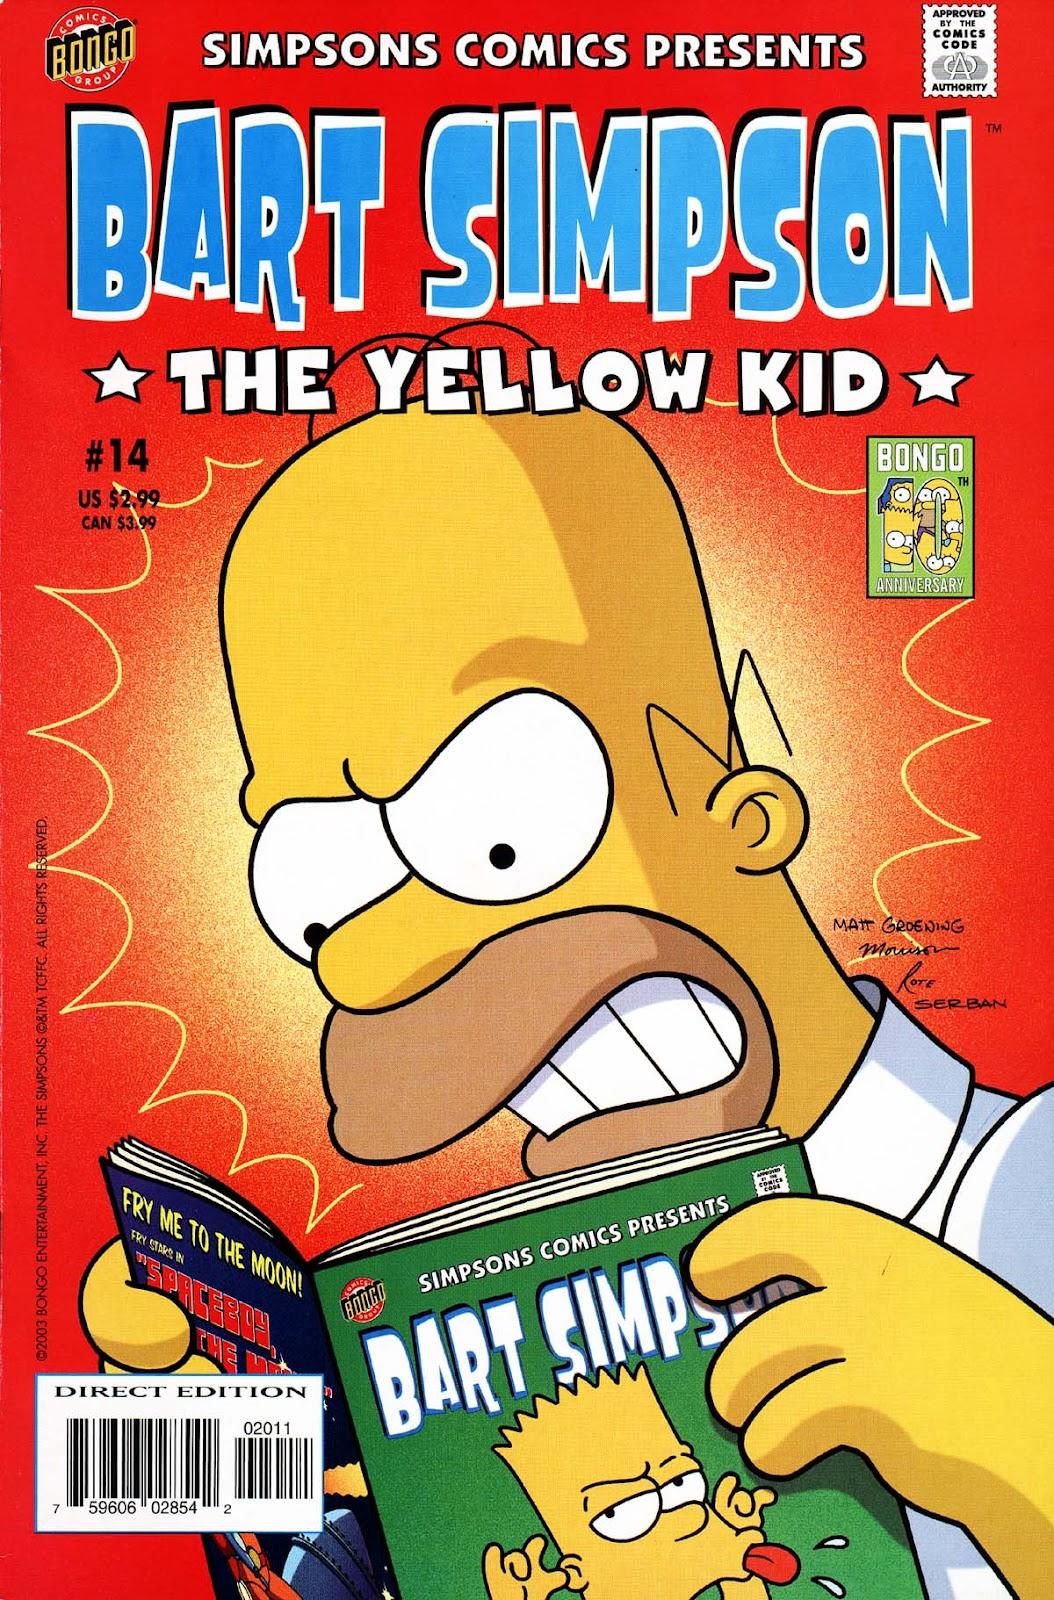 Simpsons Comics Presents Bart Simpson 14 Page 1